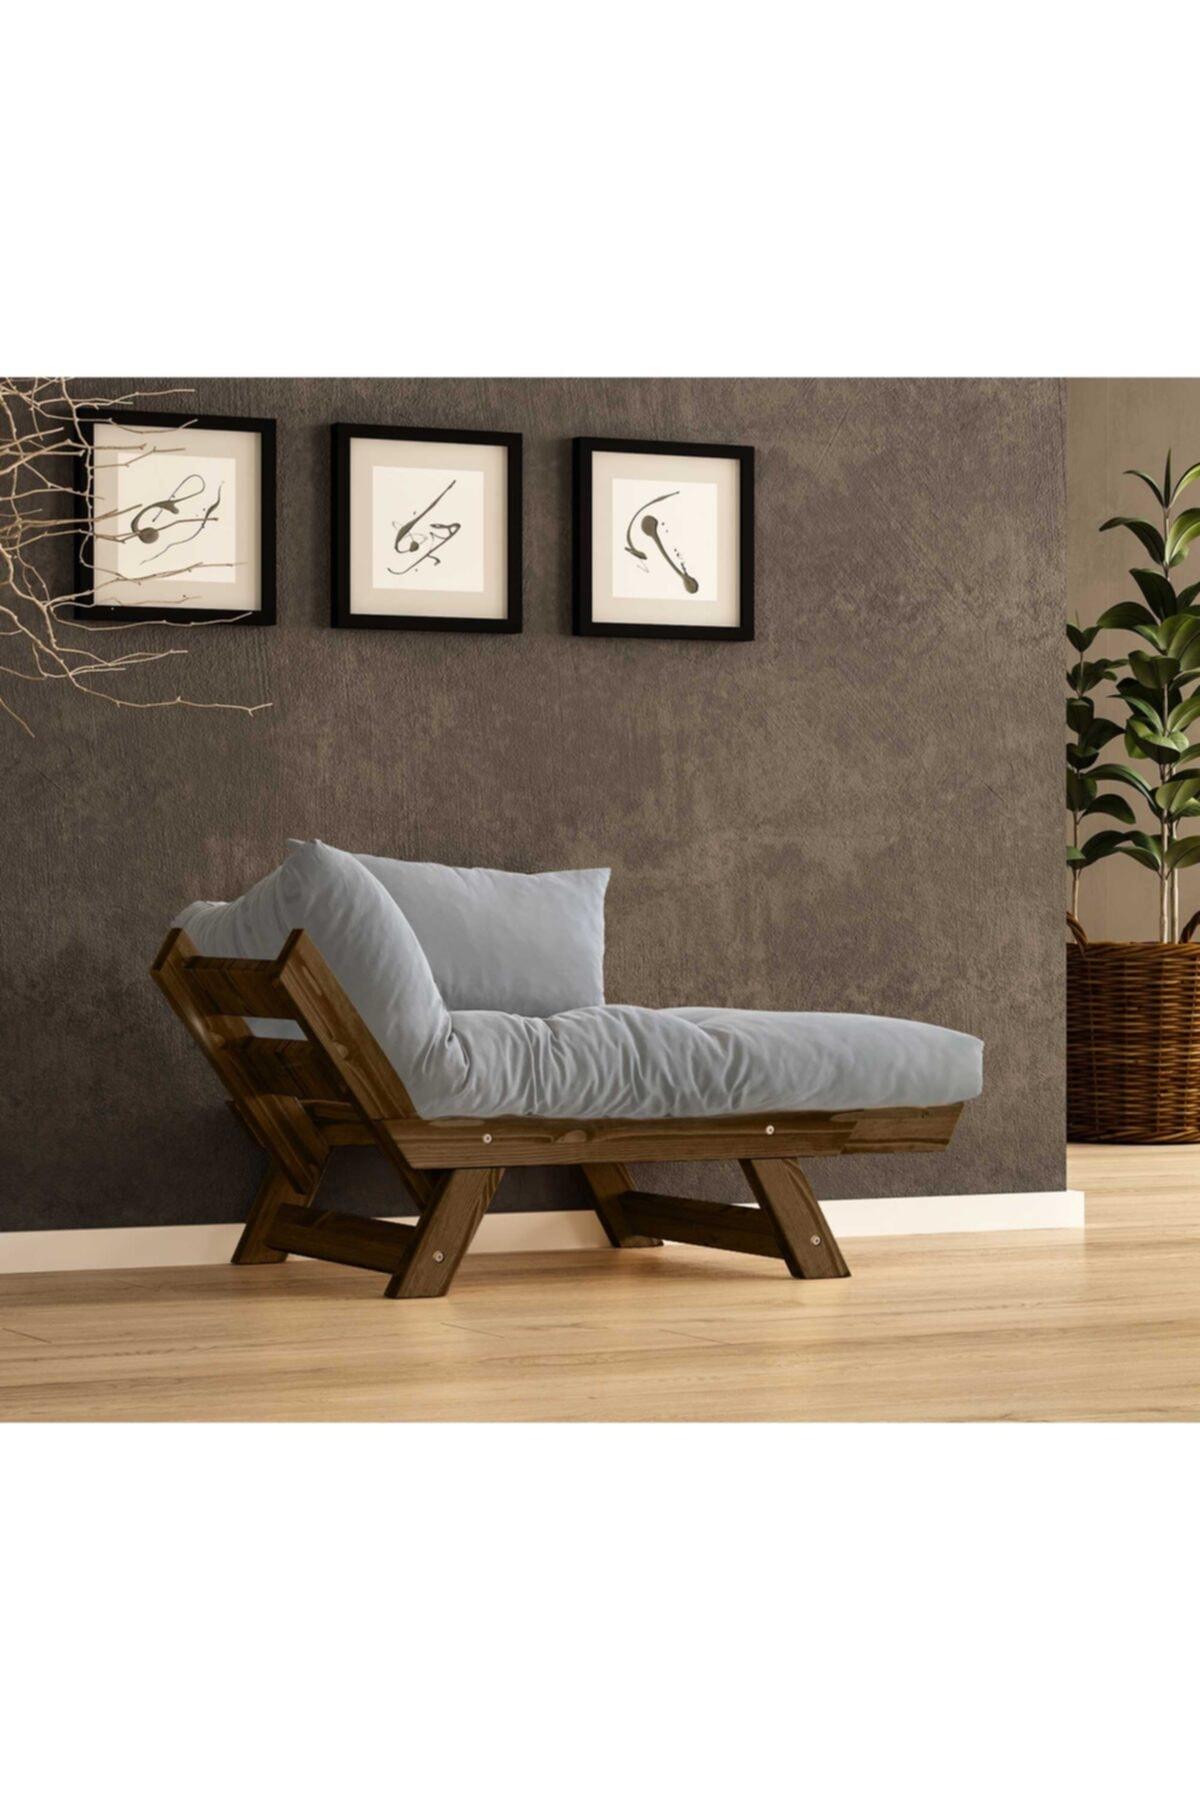 Woodesk Adalar Masif Ceviz-gri Renk Berjer 2